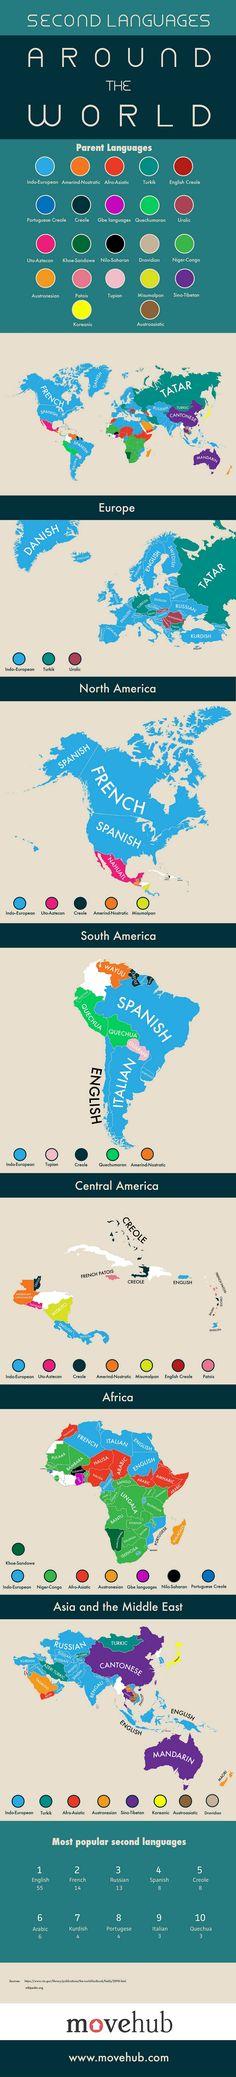 Second Language Around the World #infographic #Language #Travel